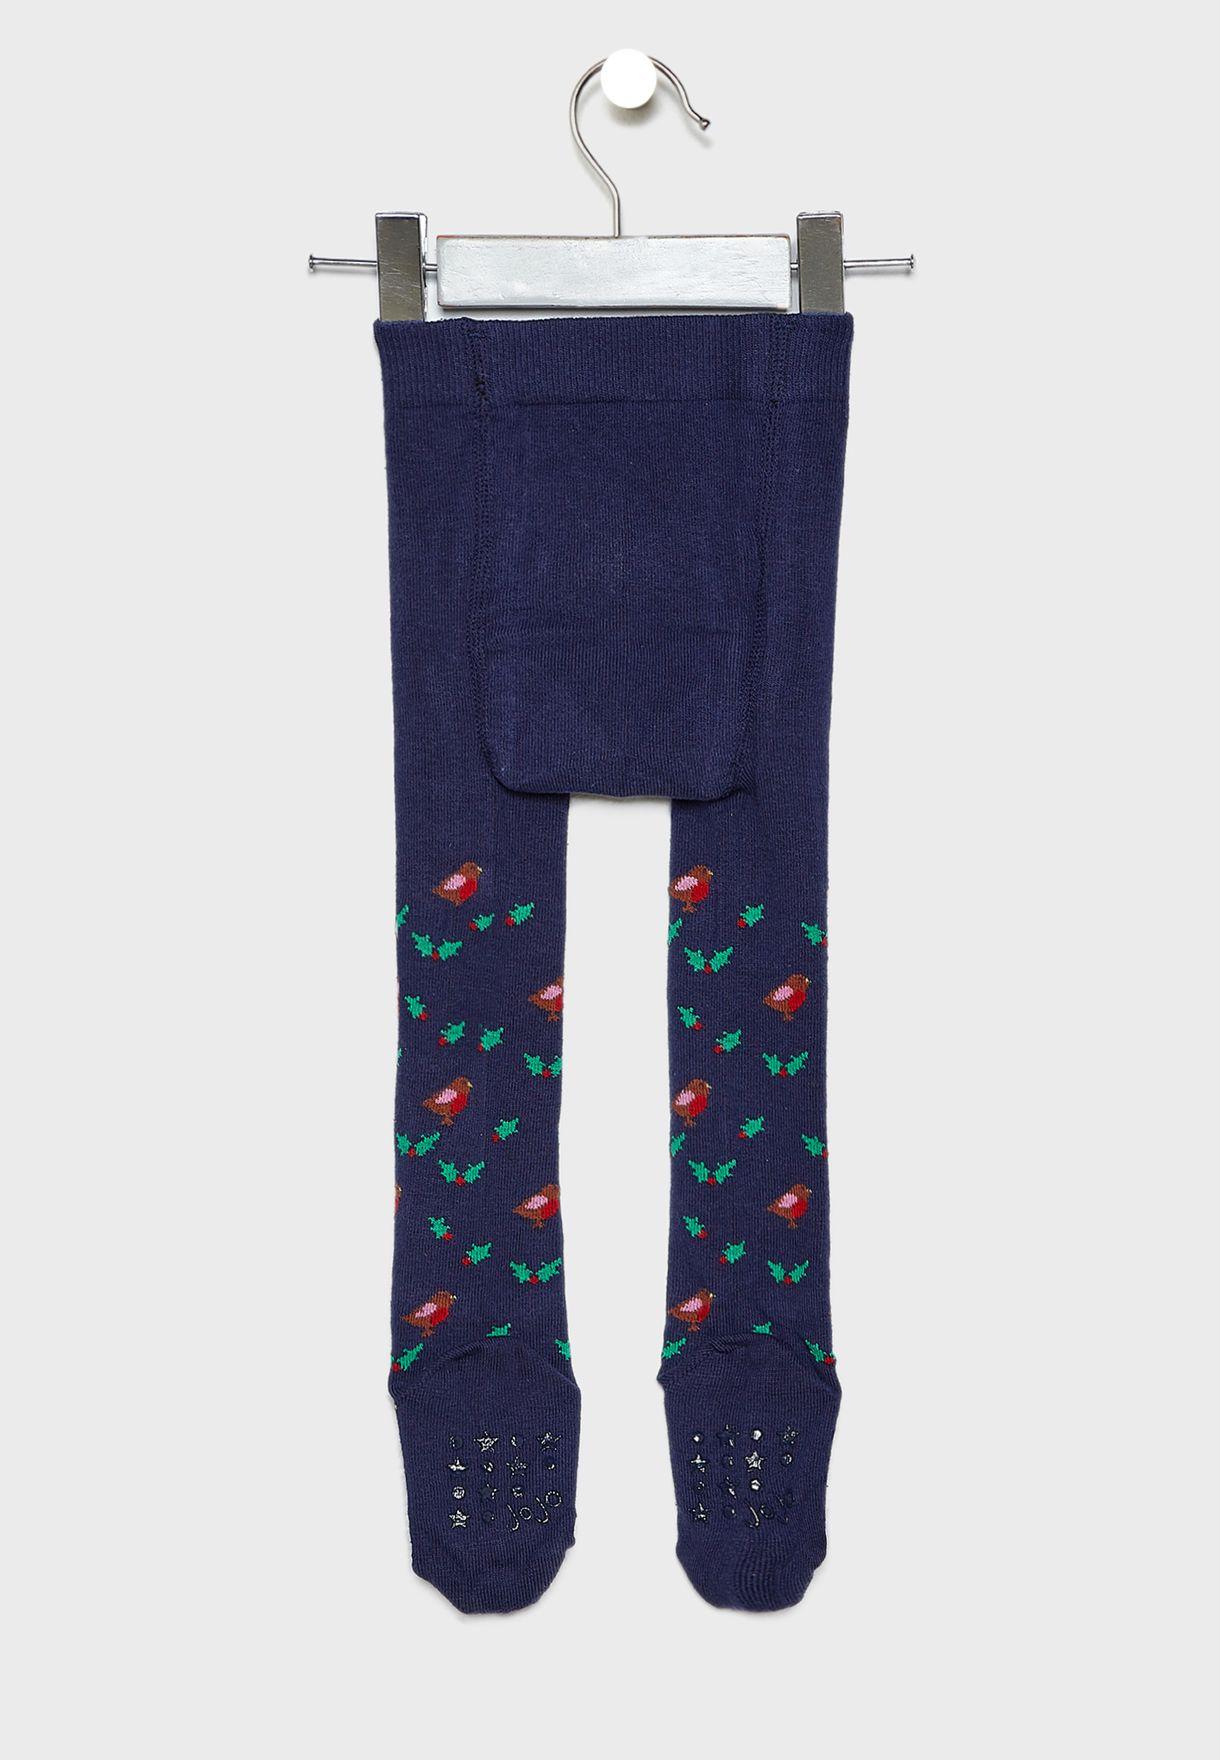 Kids Patterned Socks